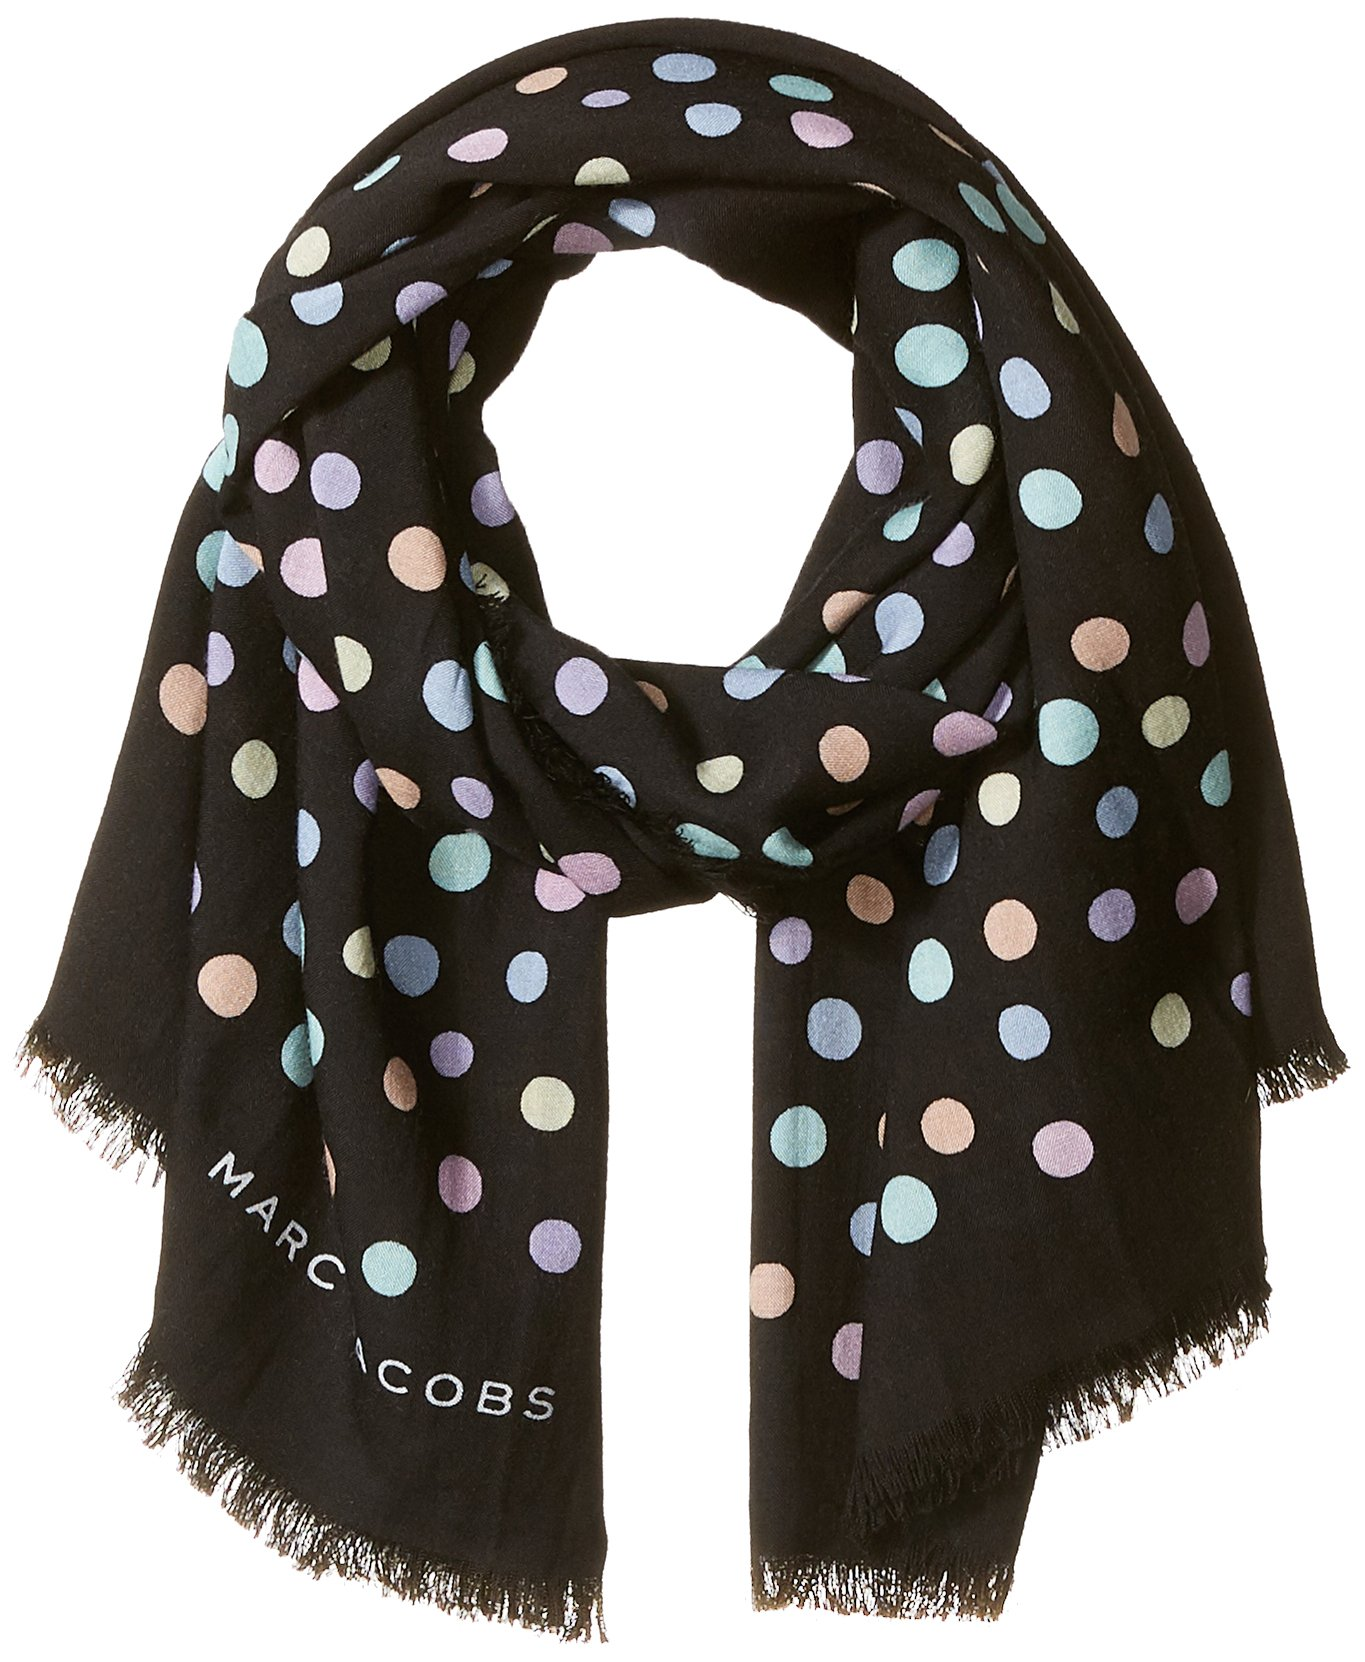 Marc Jacobs Women's Pastel Dot Large Scarf, black/Multi, One Size